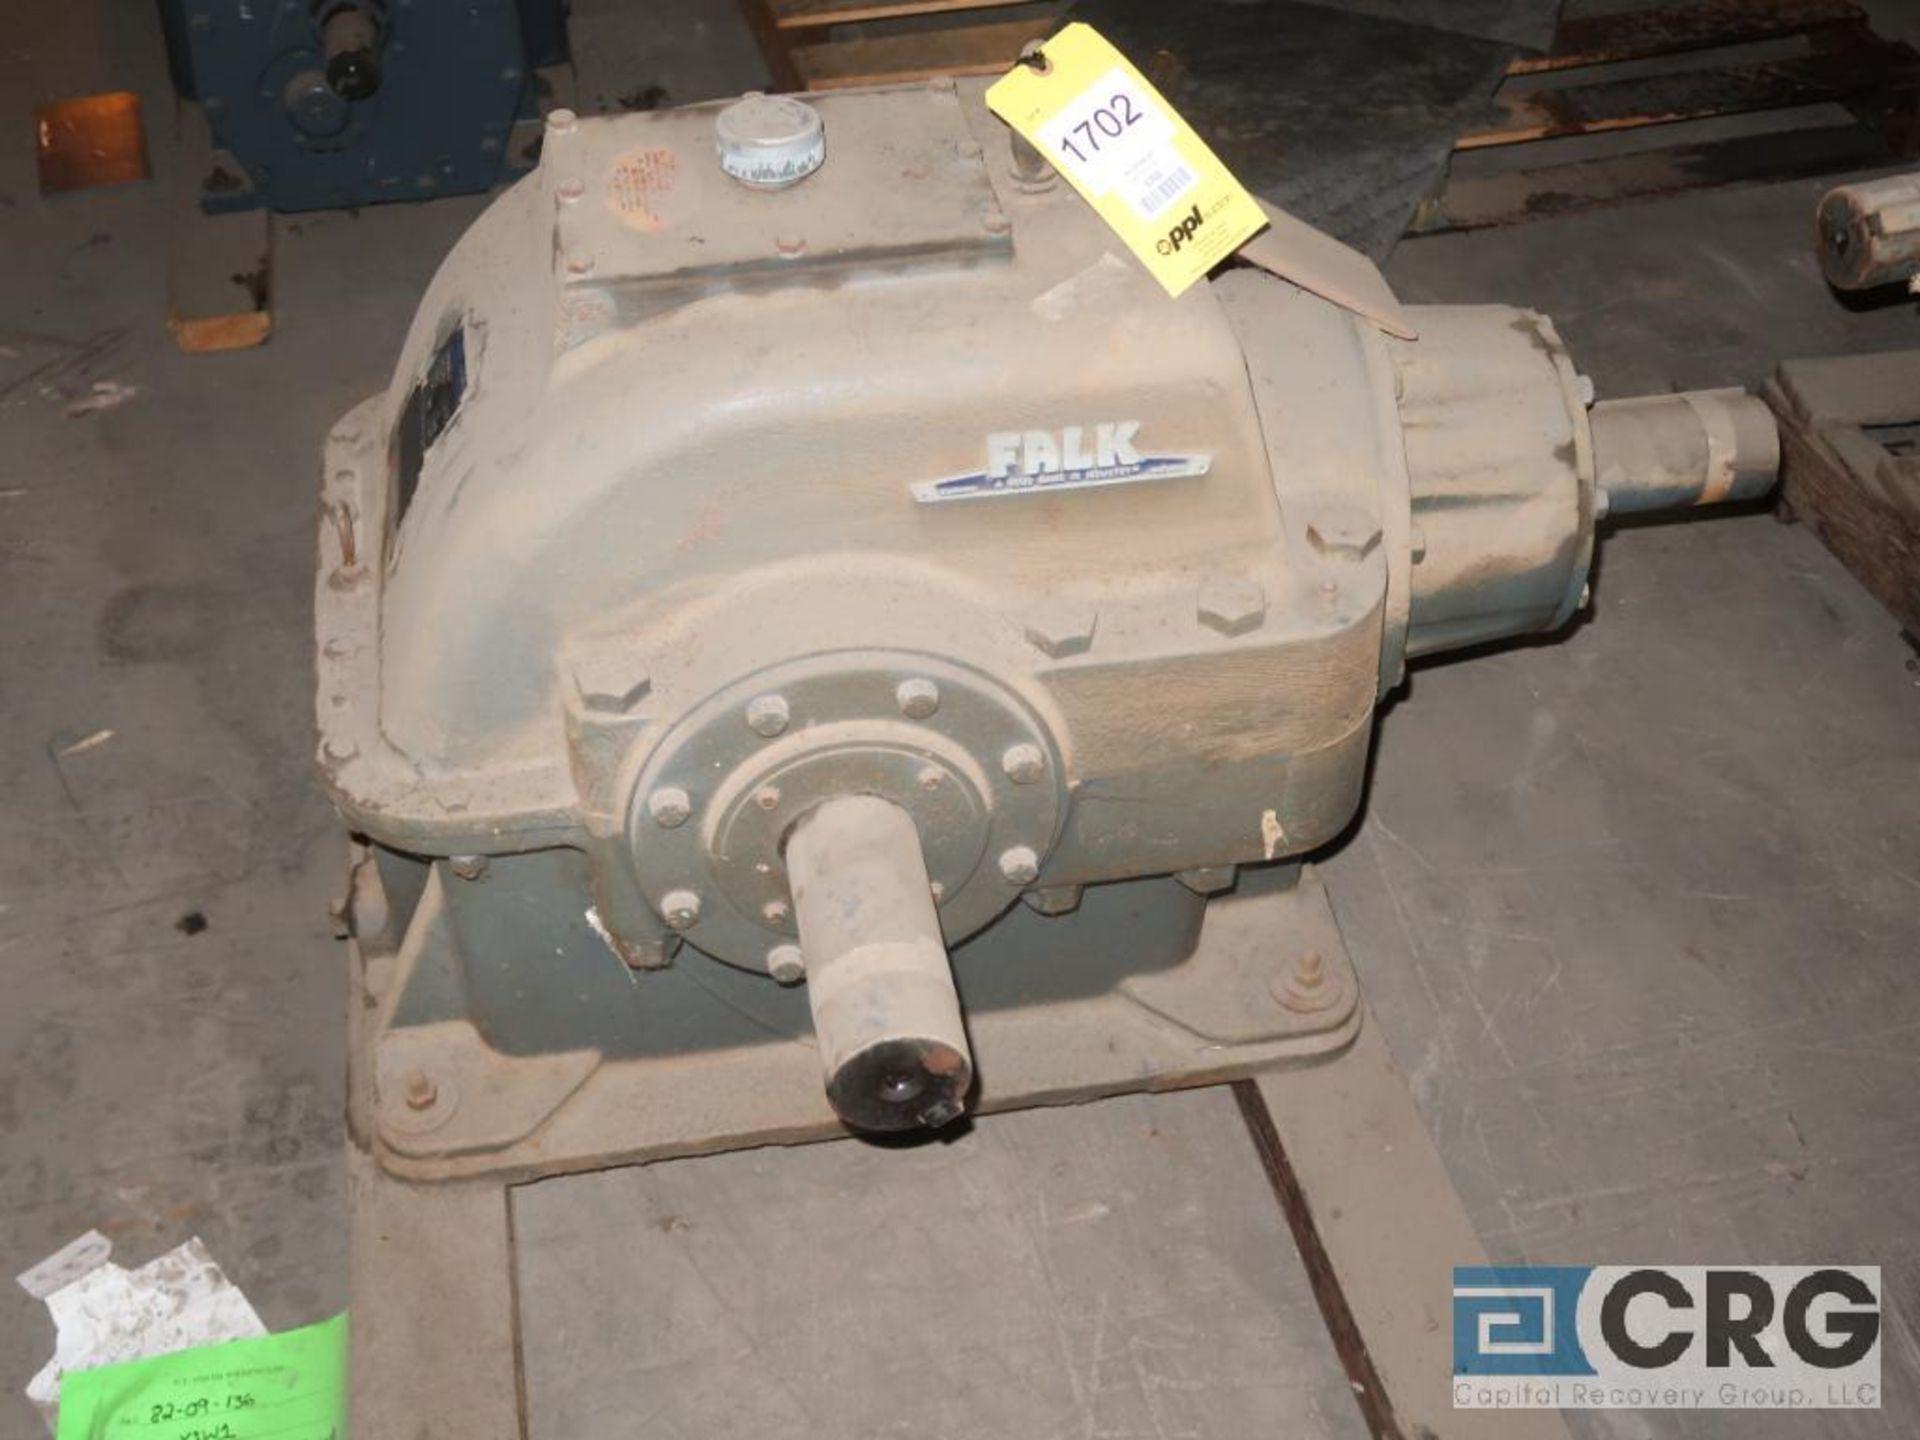 Falk 2090GHB1K gear drive, ratio-2.765, input RPM 734.66, output RPM 265.7, service rate HP. 50, s/n